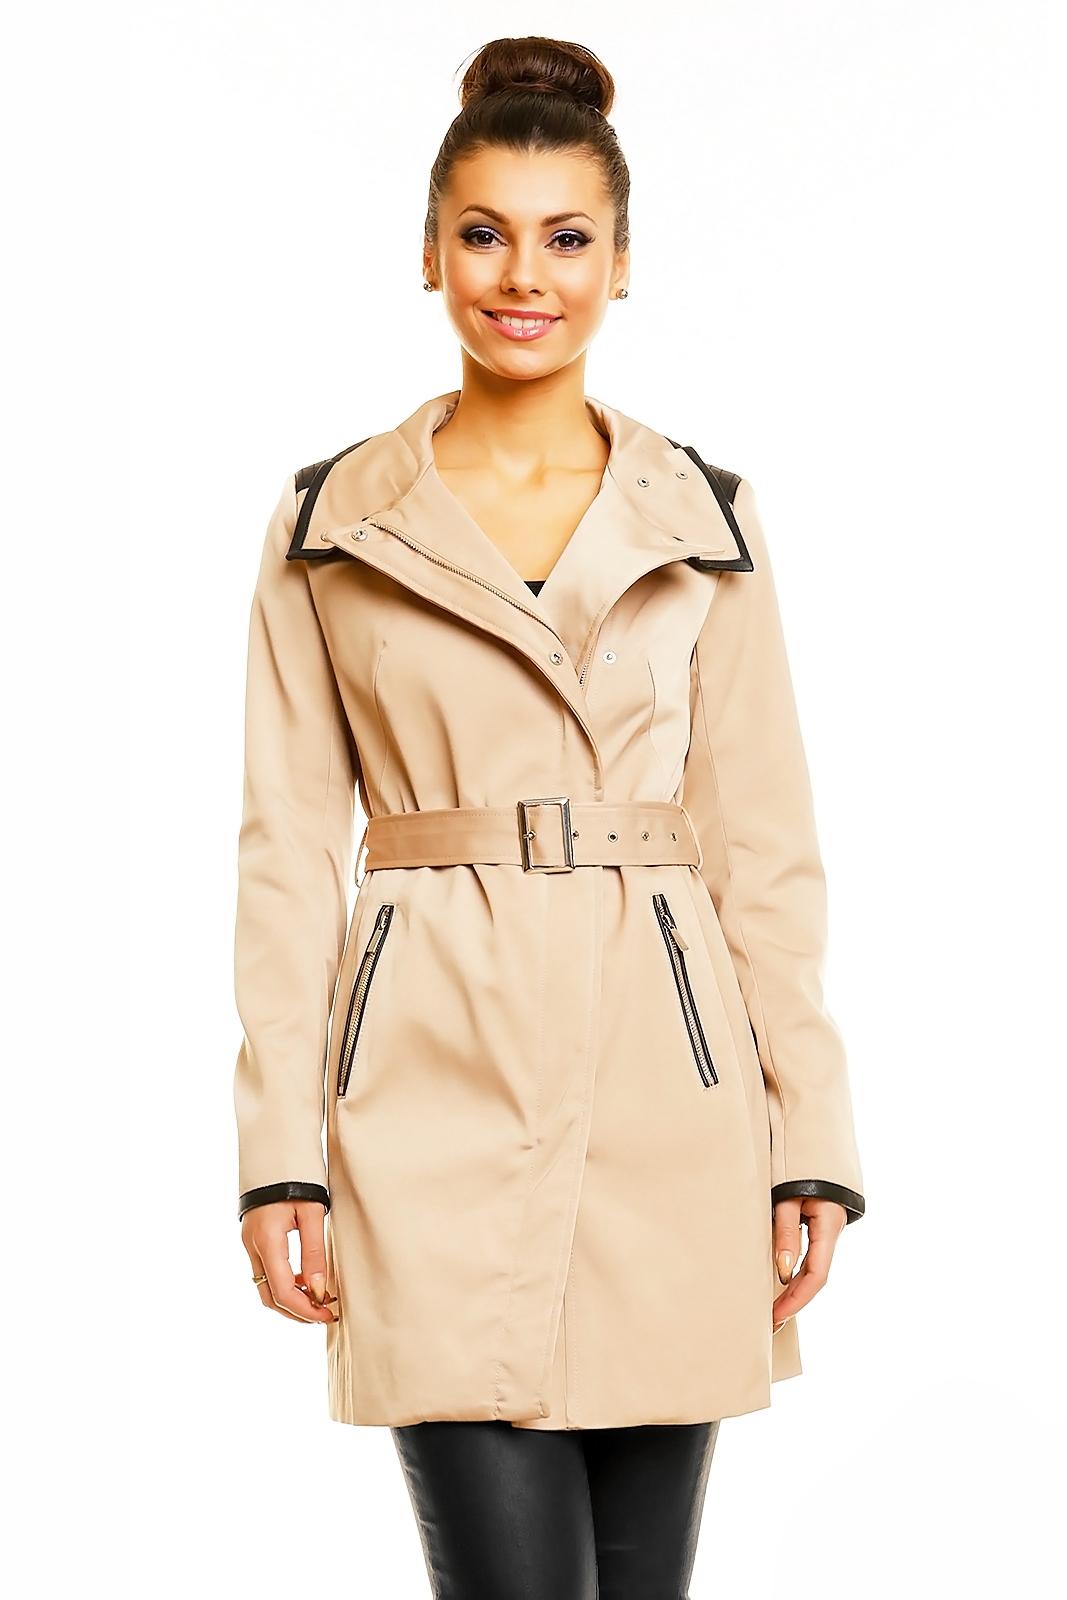 fa1cc36078 Béžový dámský dlouhý kabát